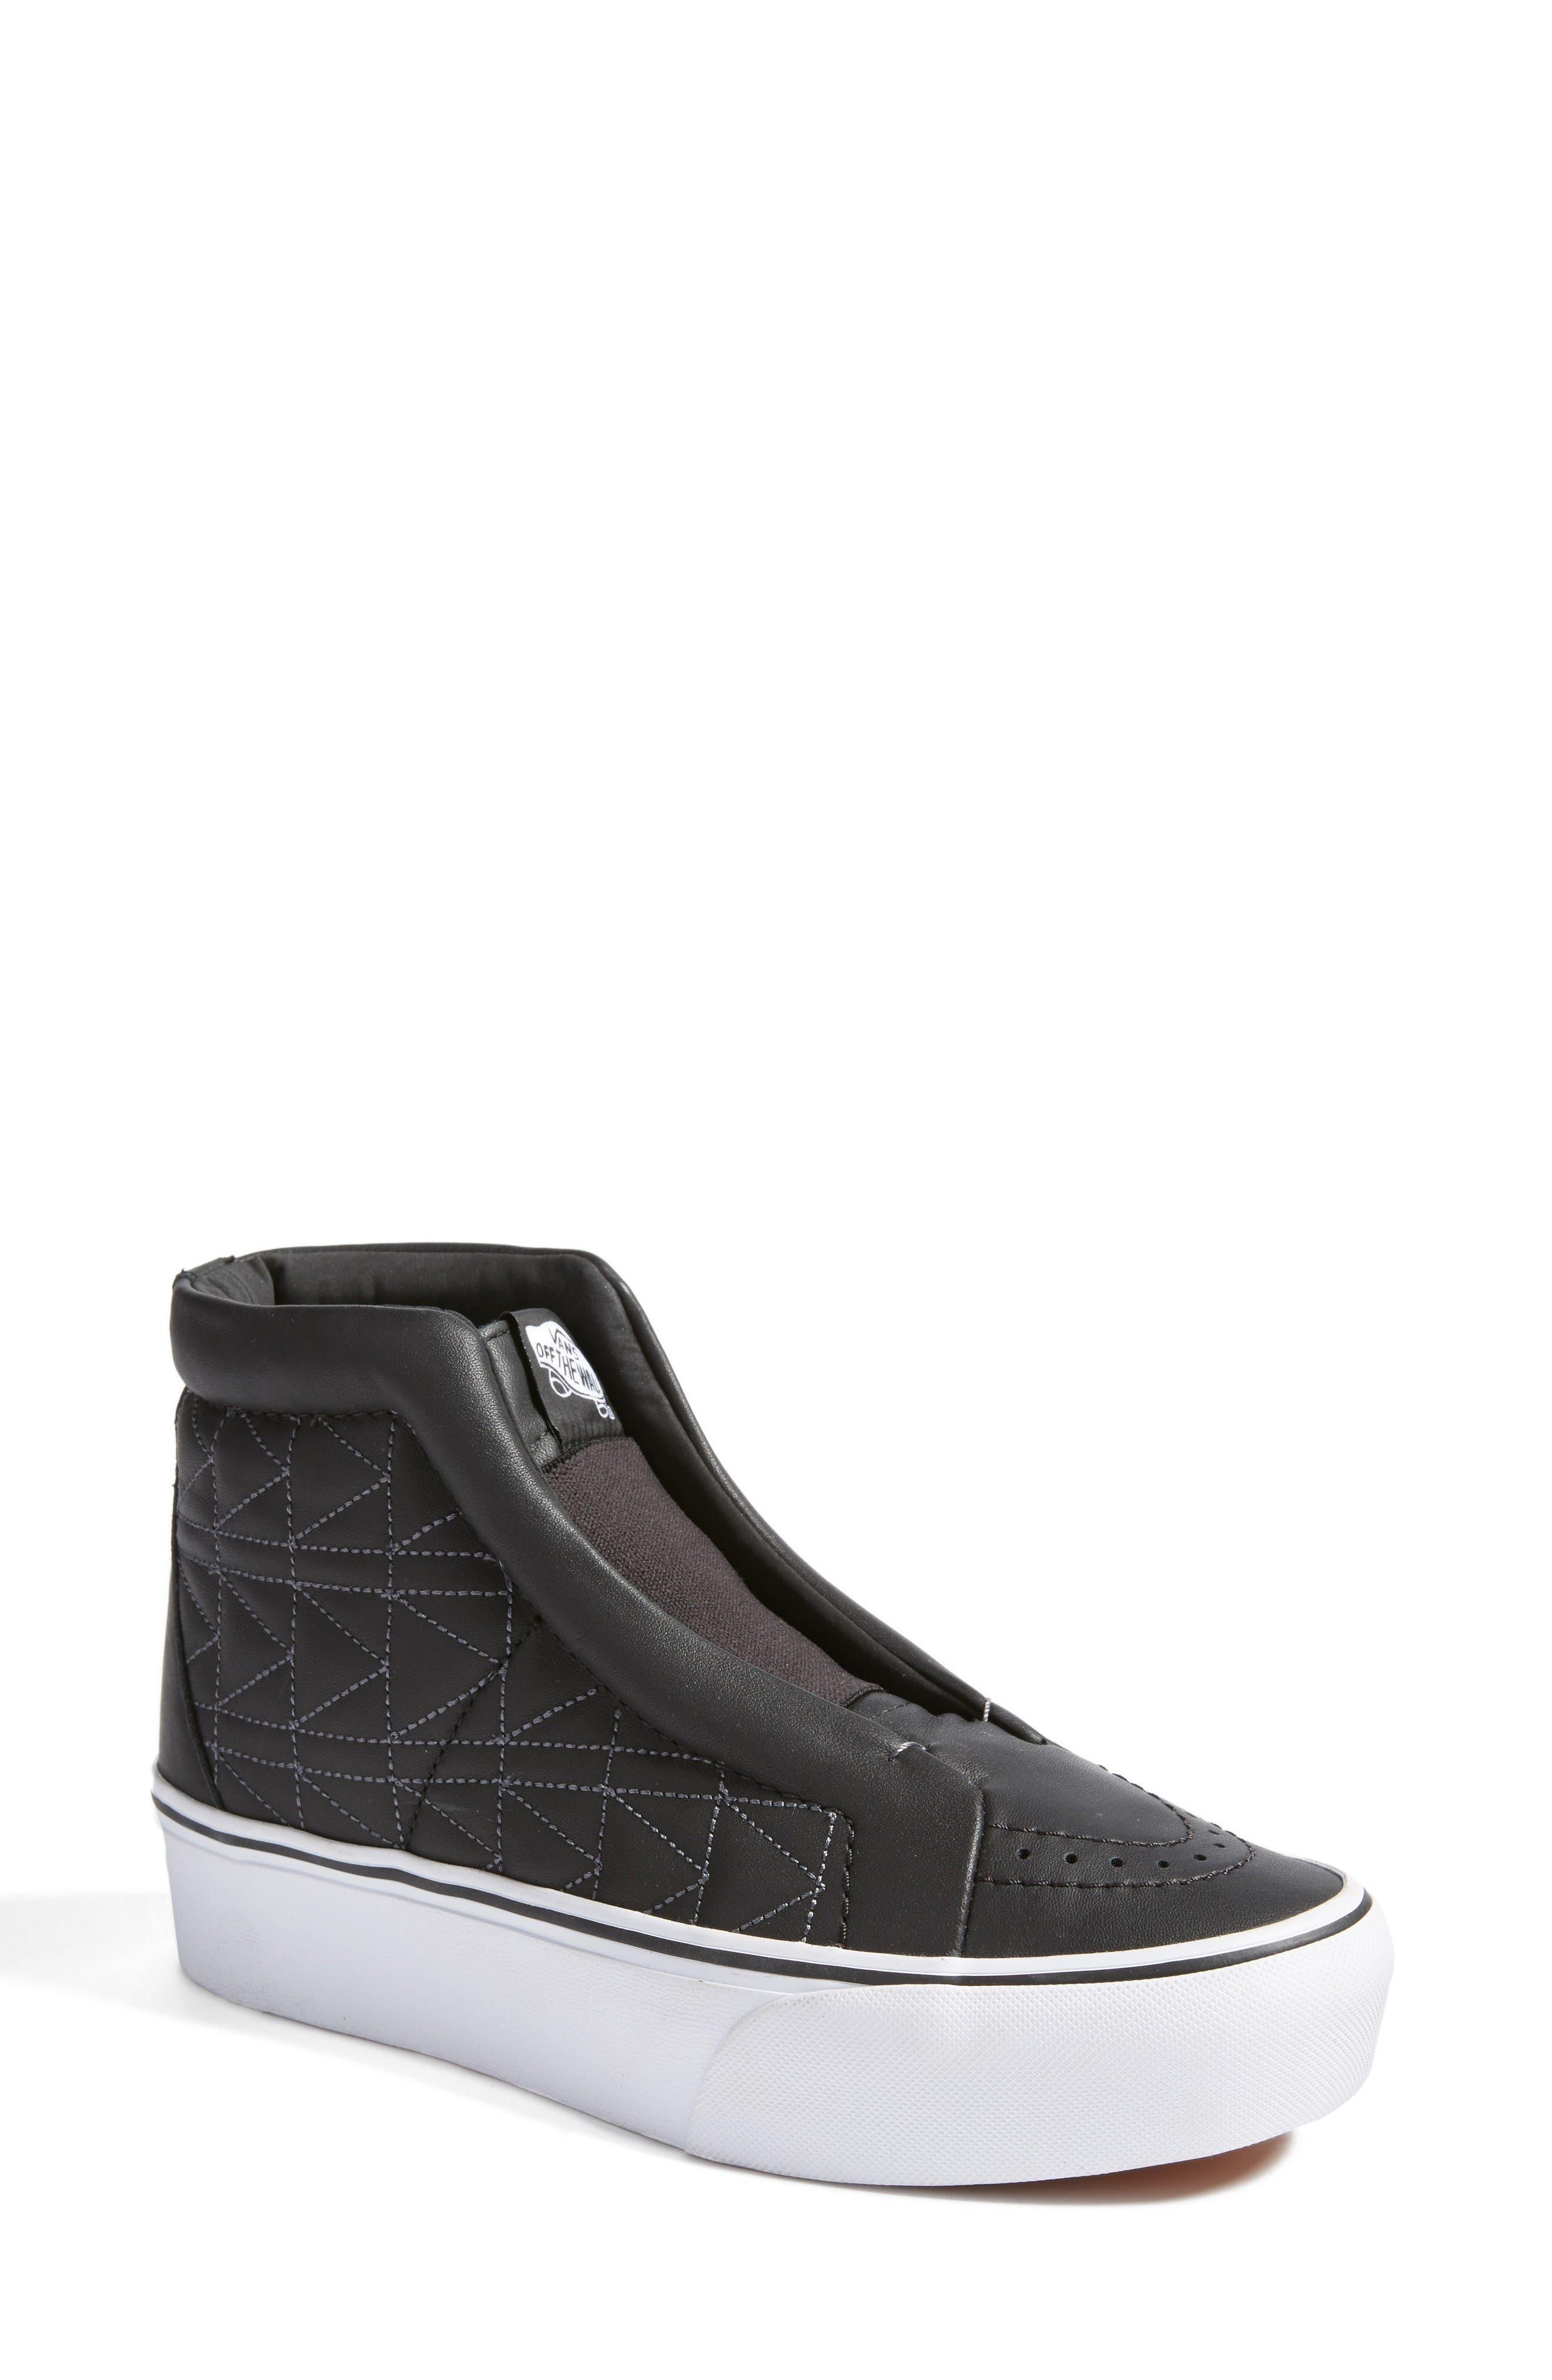 Main Image - Vans x KARL LAGERFELD SK8-Hi Leather Sneaker (Women)